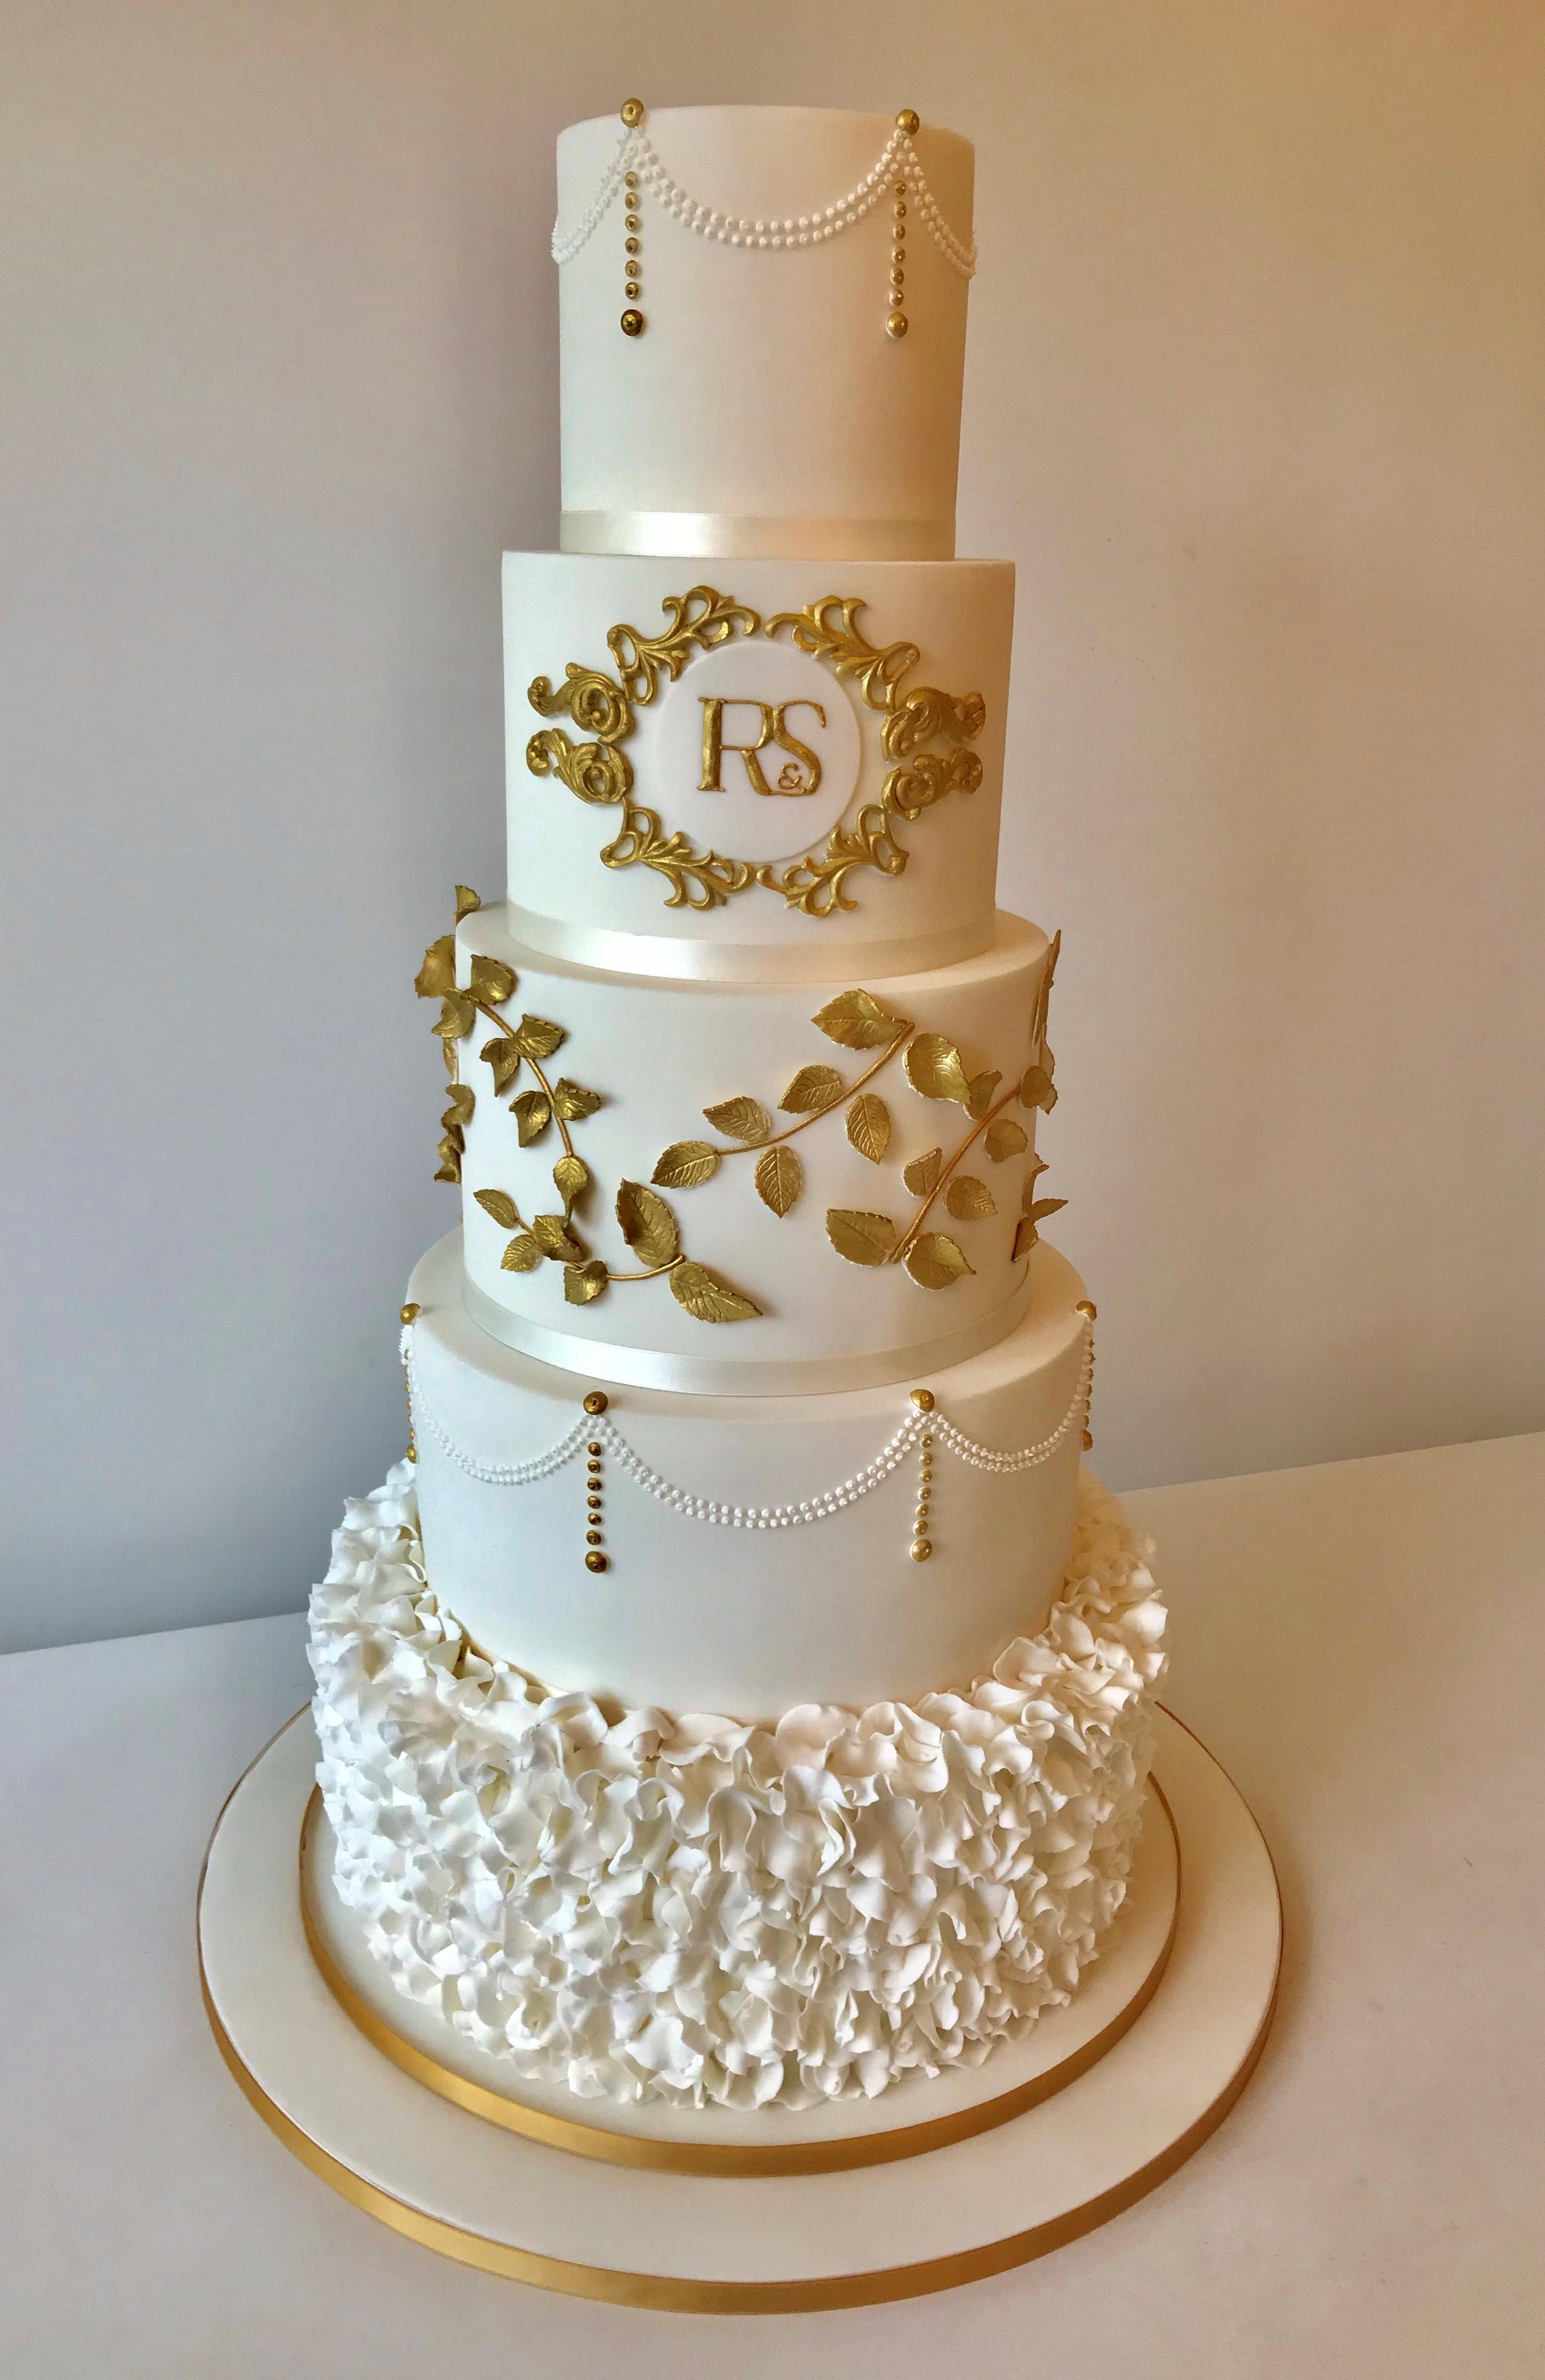 Blue drip cake   Cake, Blue drip cake, Cake designs